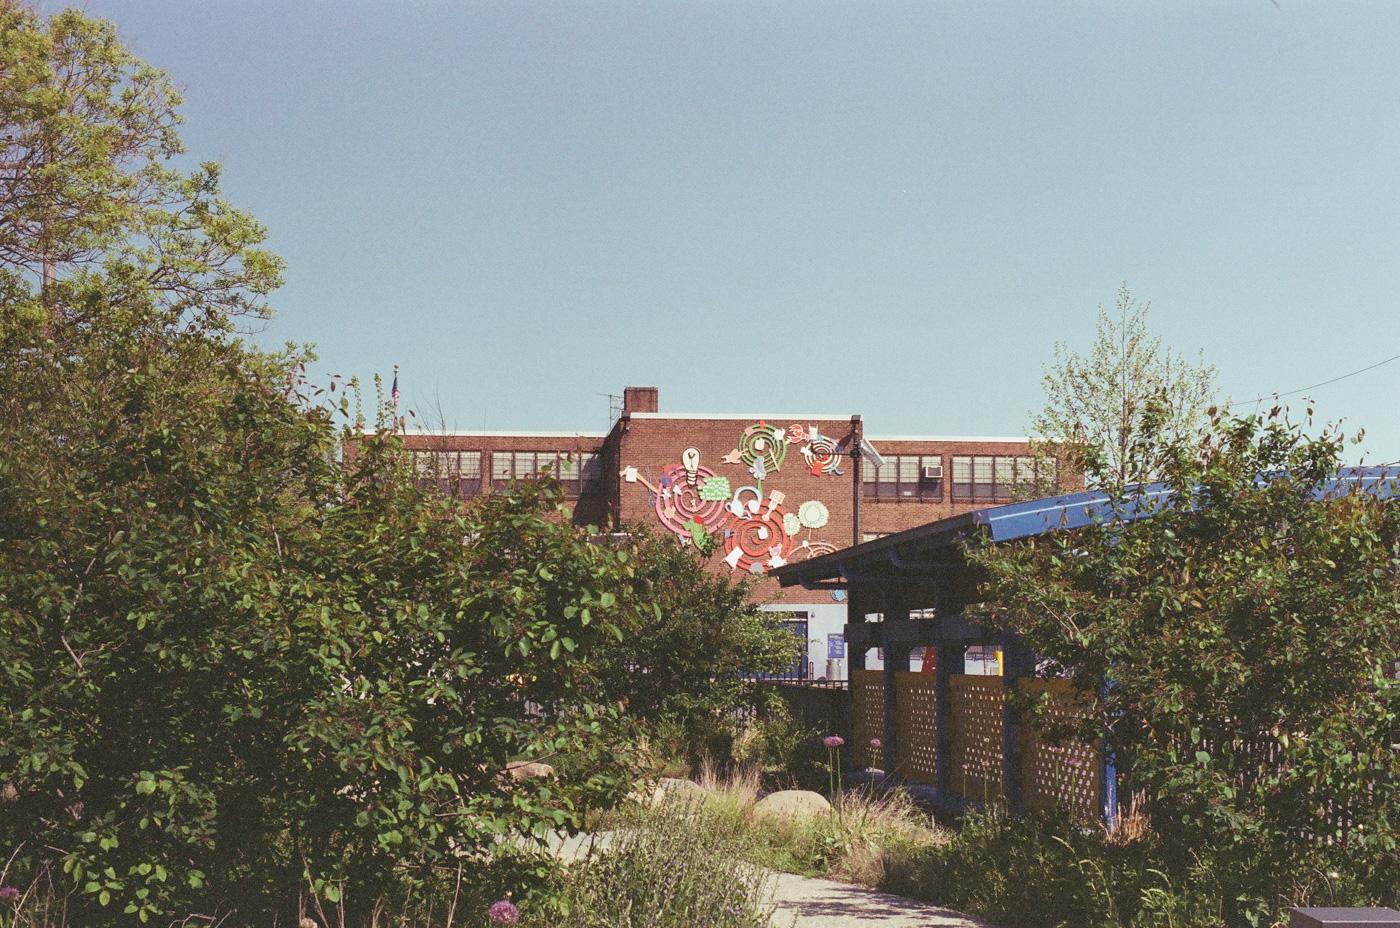 Chester A. Arthur School